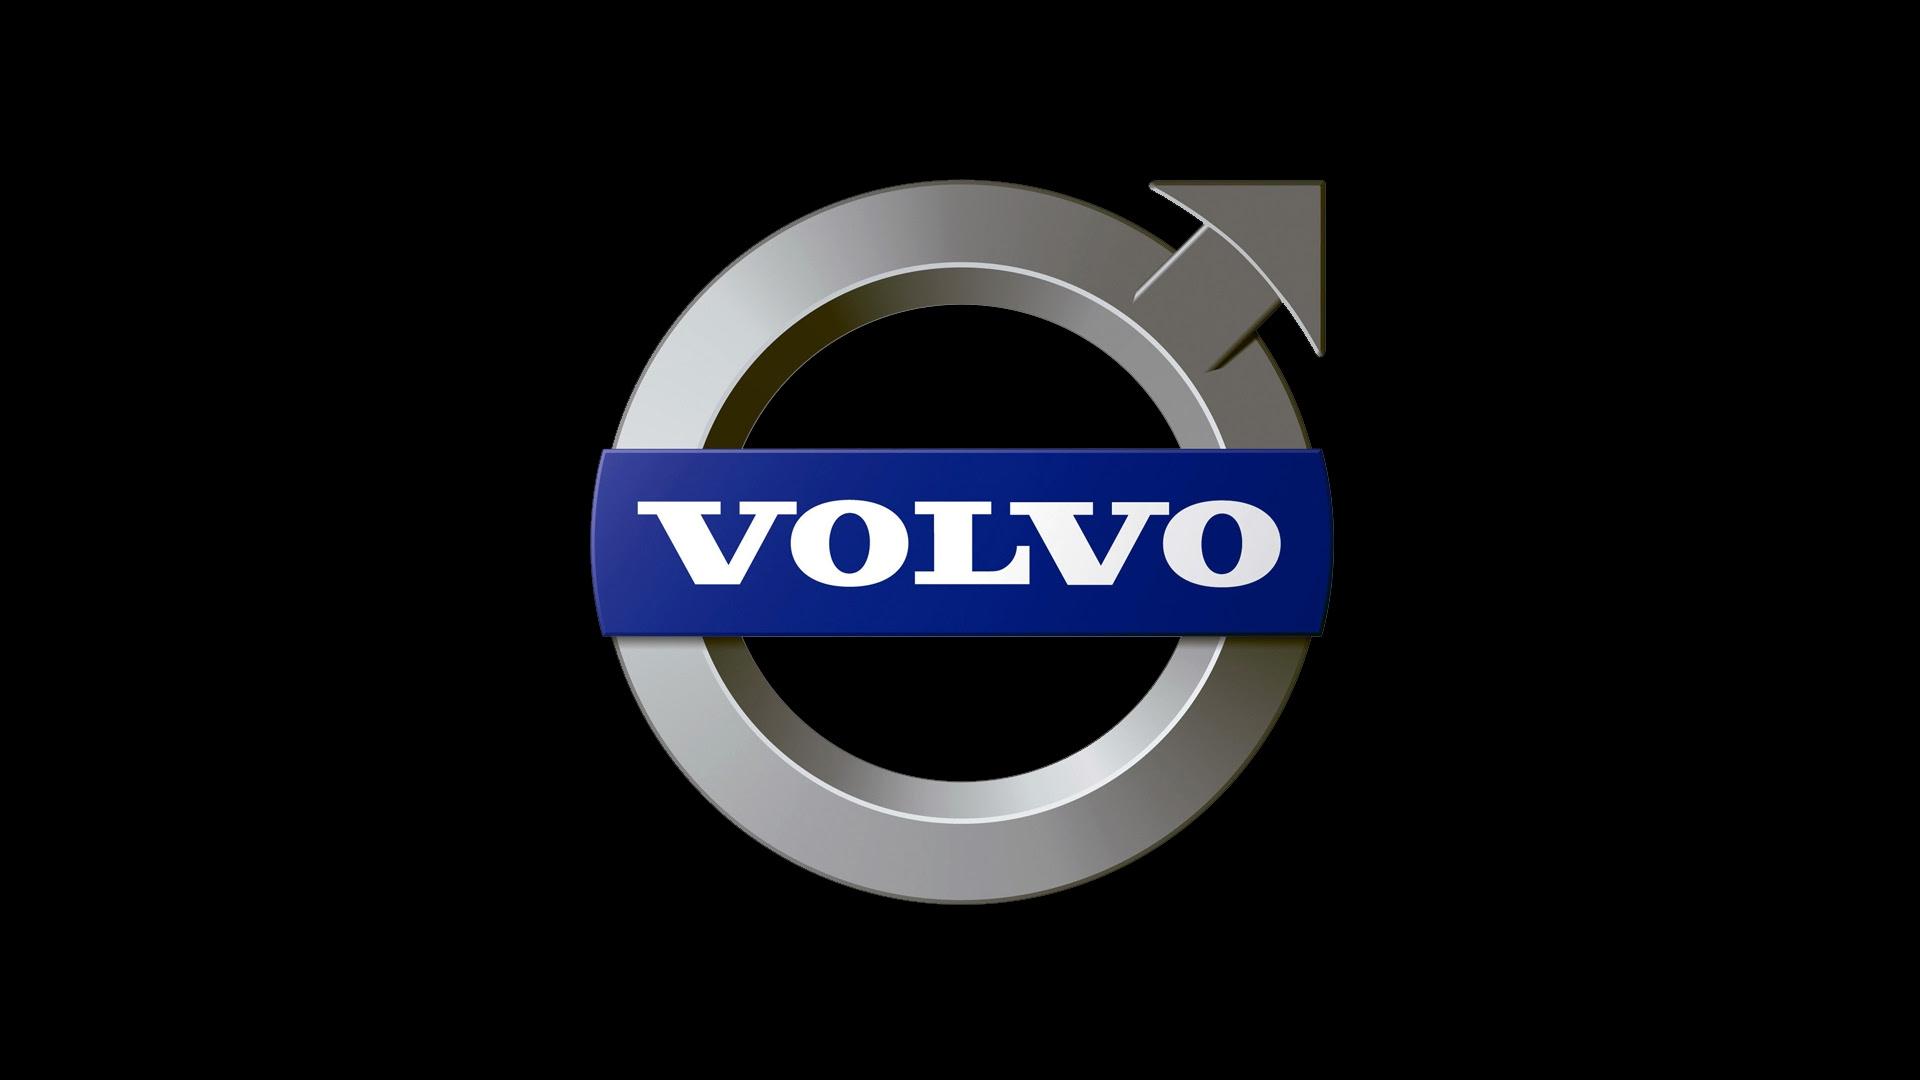 Volvo Logo Wallpaper 59098 1920x1080 px ~ HDWallSource.com